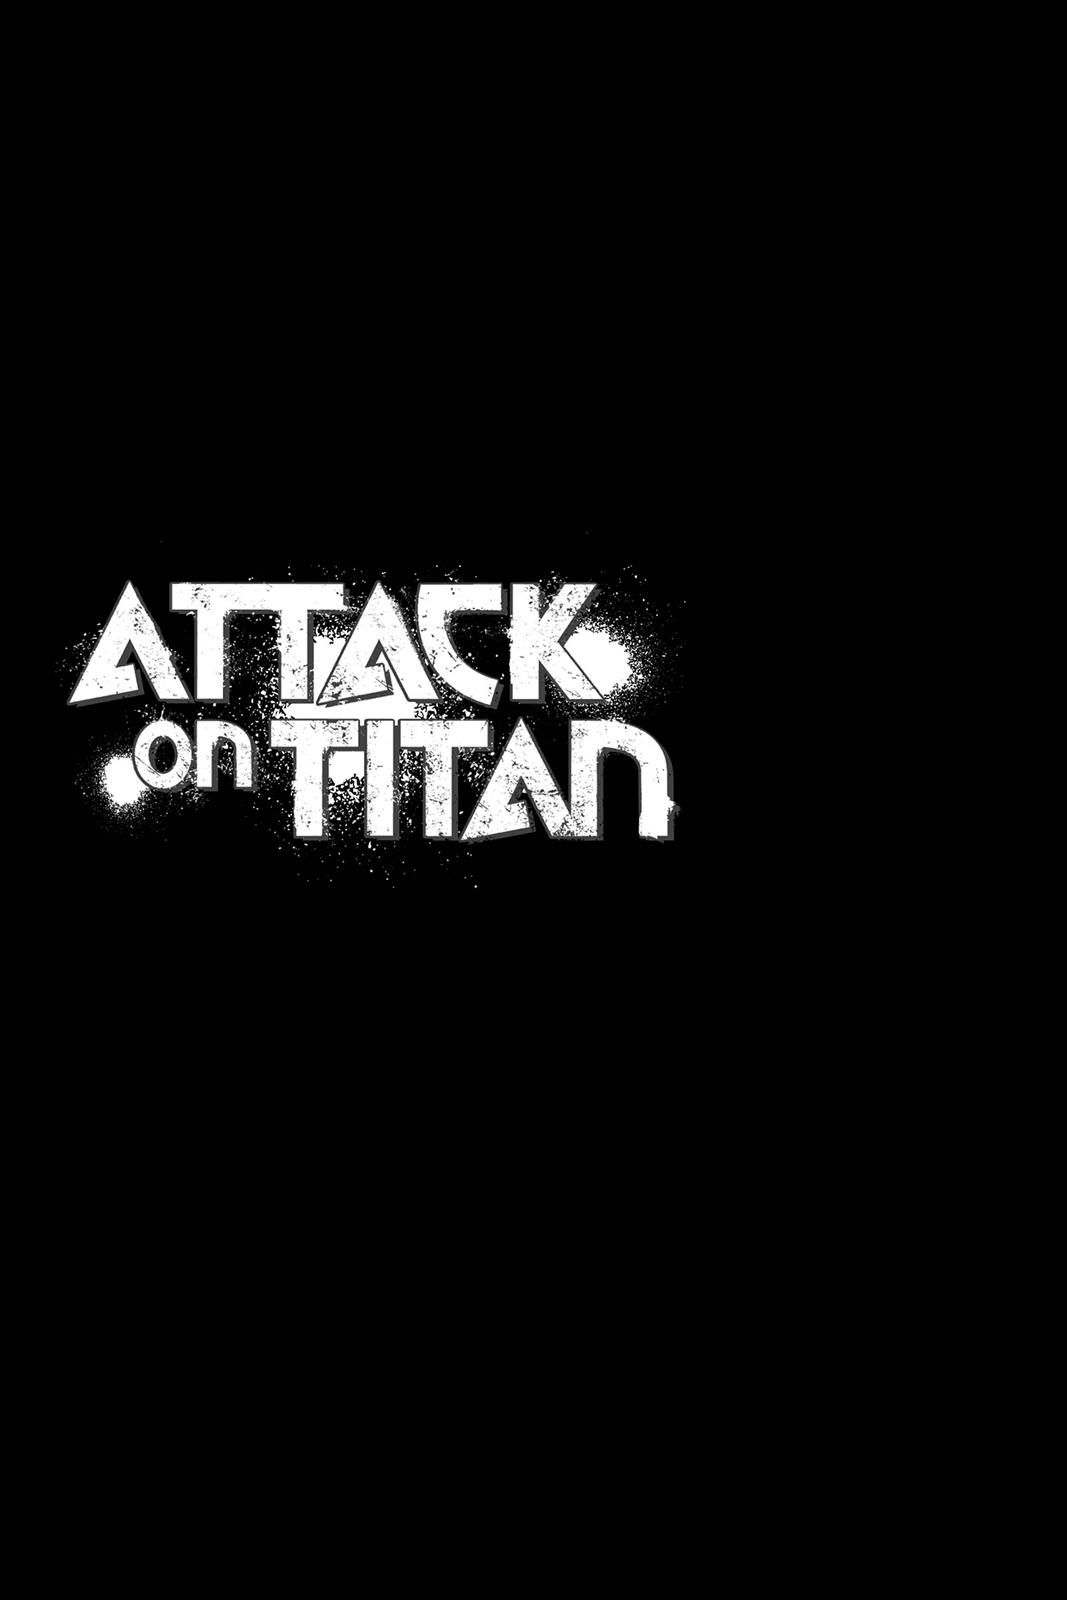 Attack On Titan, Episode 92 image 041